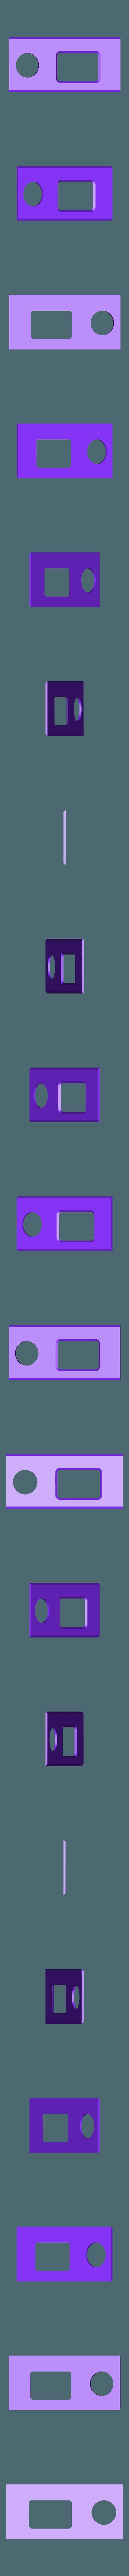 LCD_COVER_NO_MICROSD.stl Download free STL file CR20 / CR20 PRO LCD COVER • 3D printer object, GREGCAR_3DPrinting